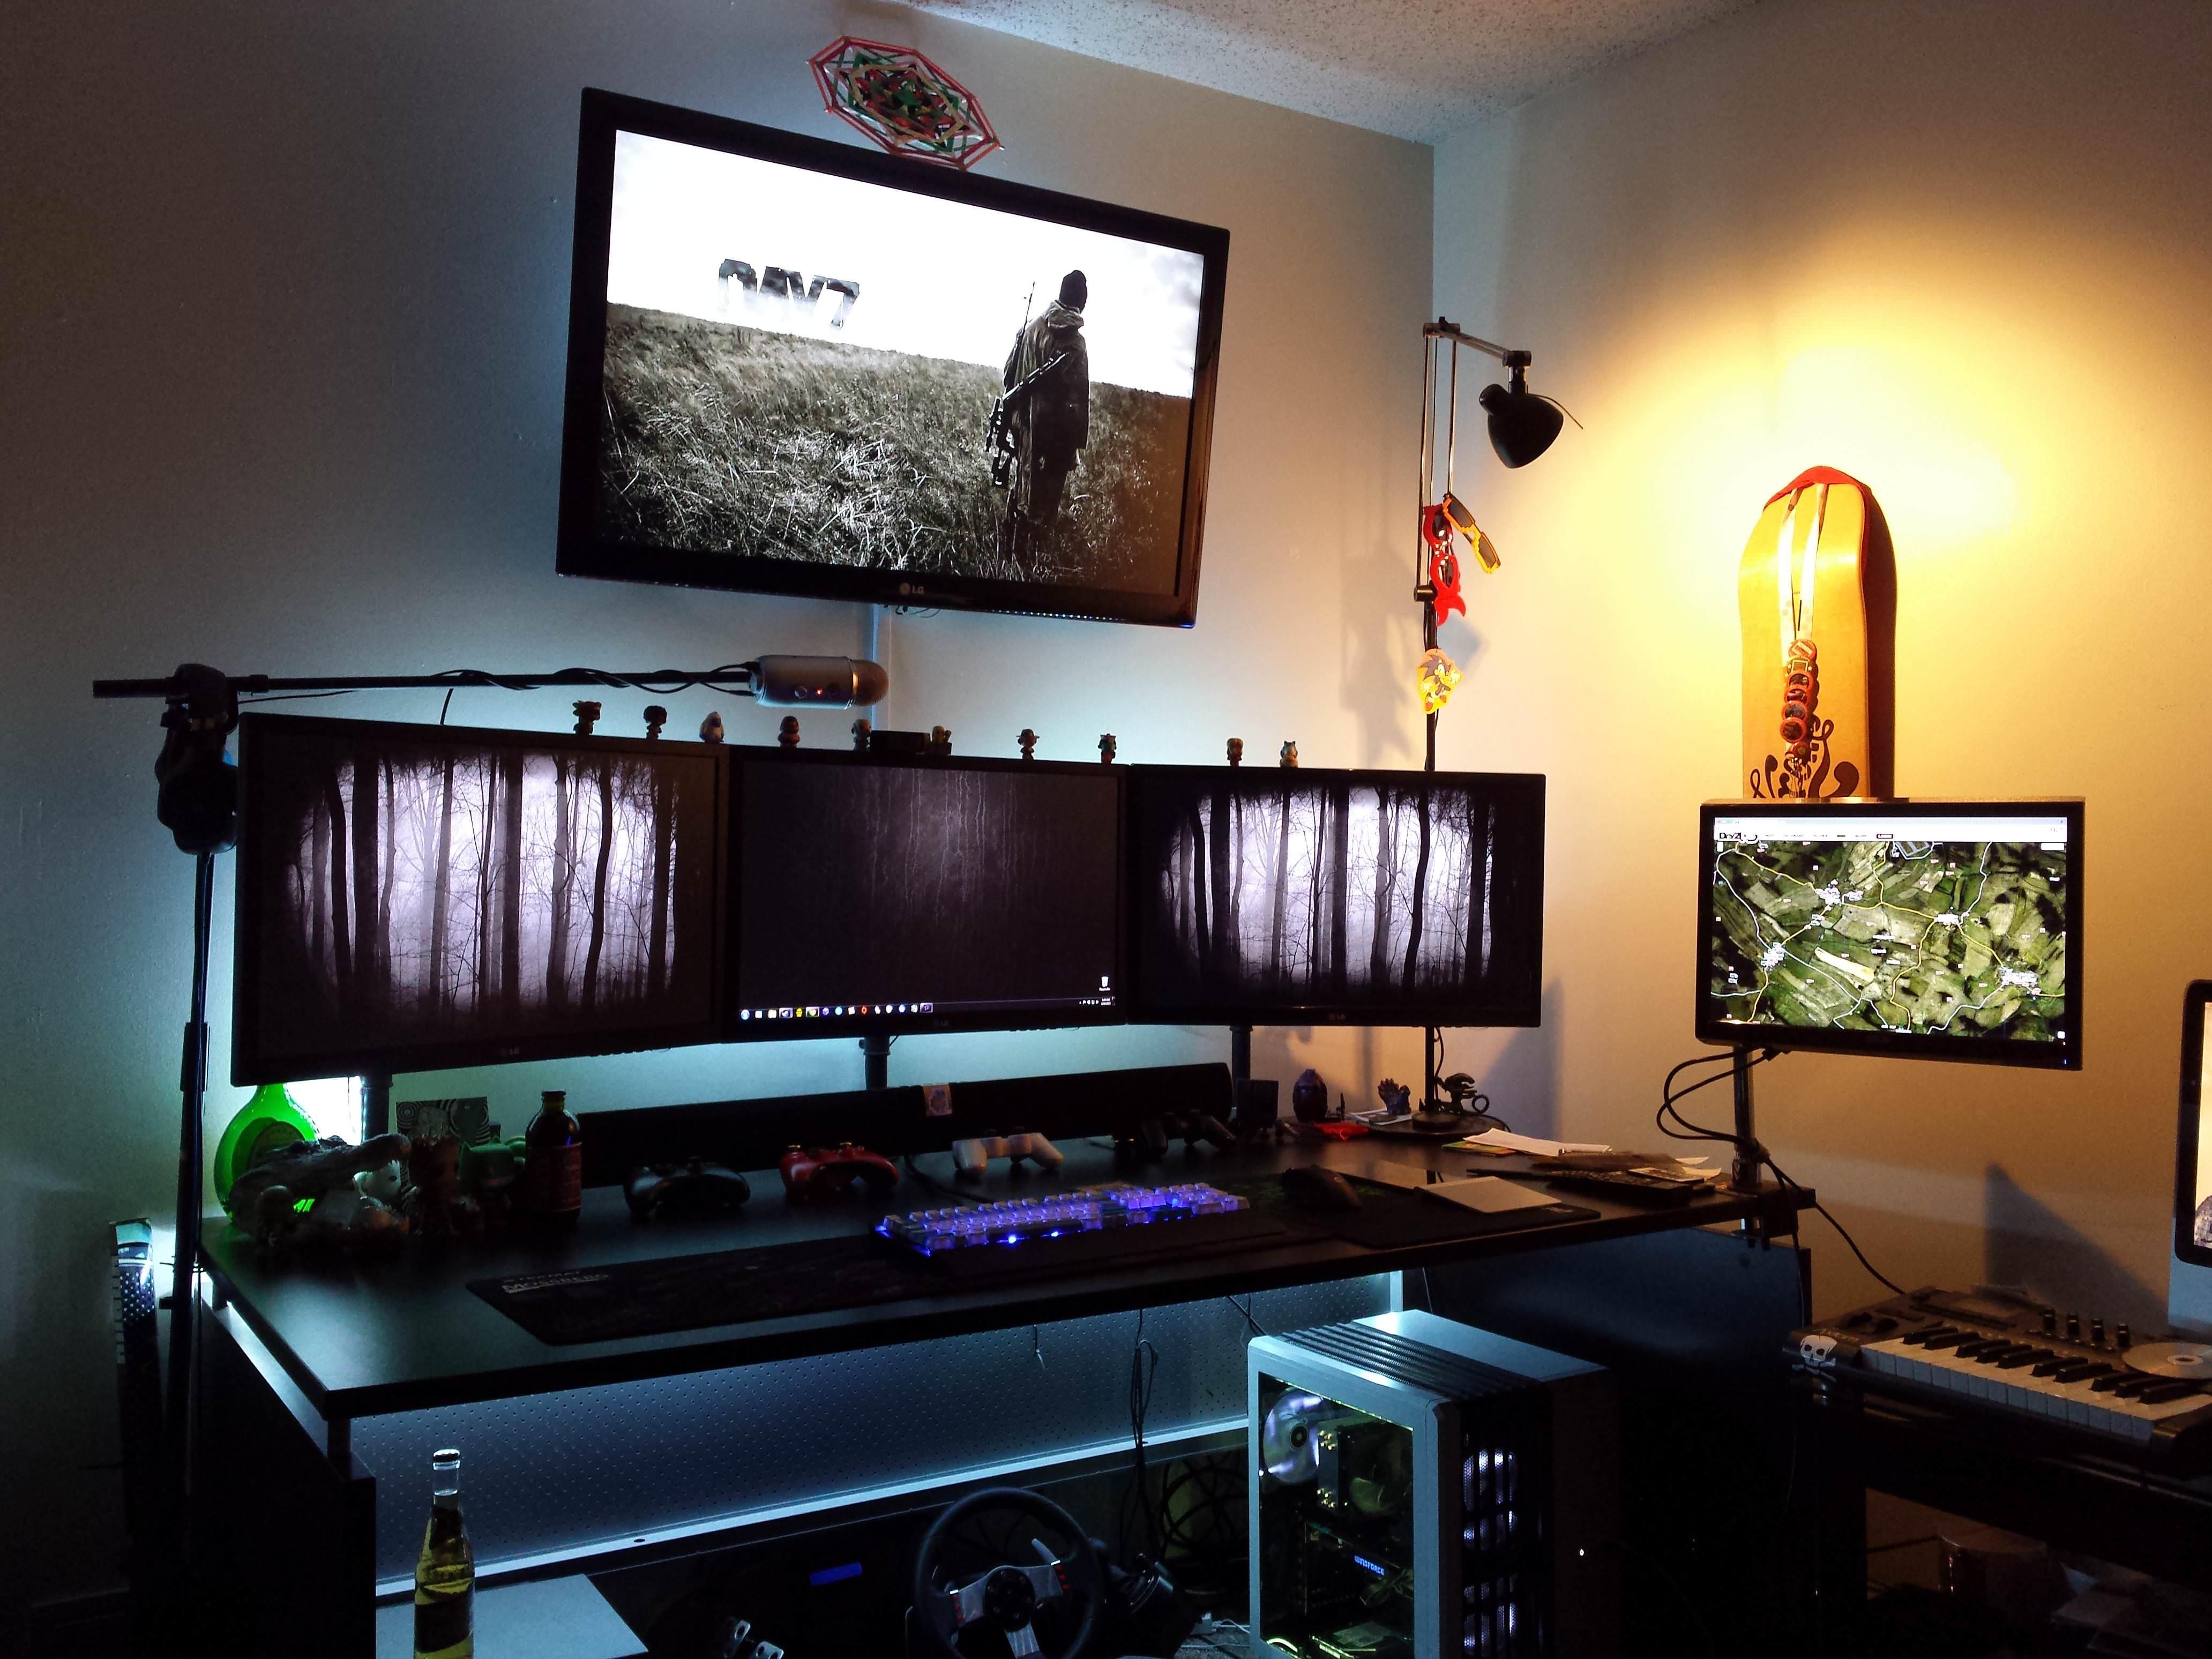 25 Amazing PC Gaming Battlestations ForeverGeek